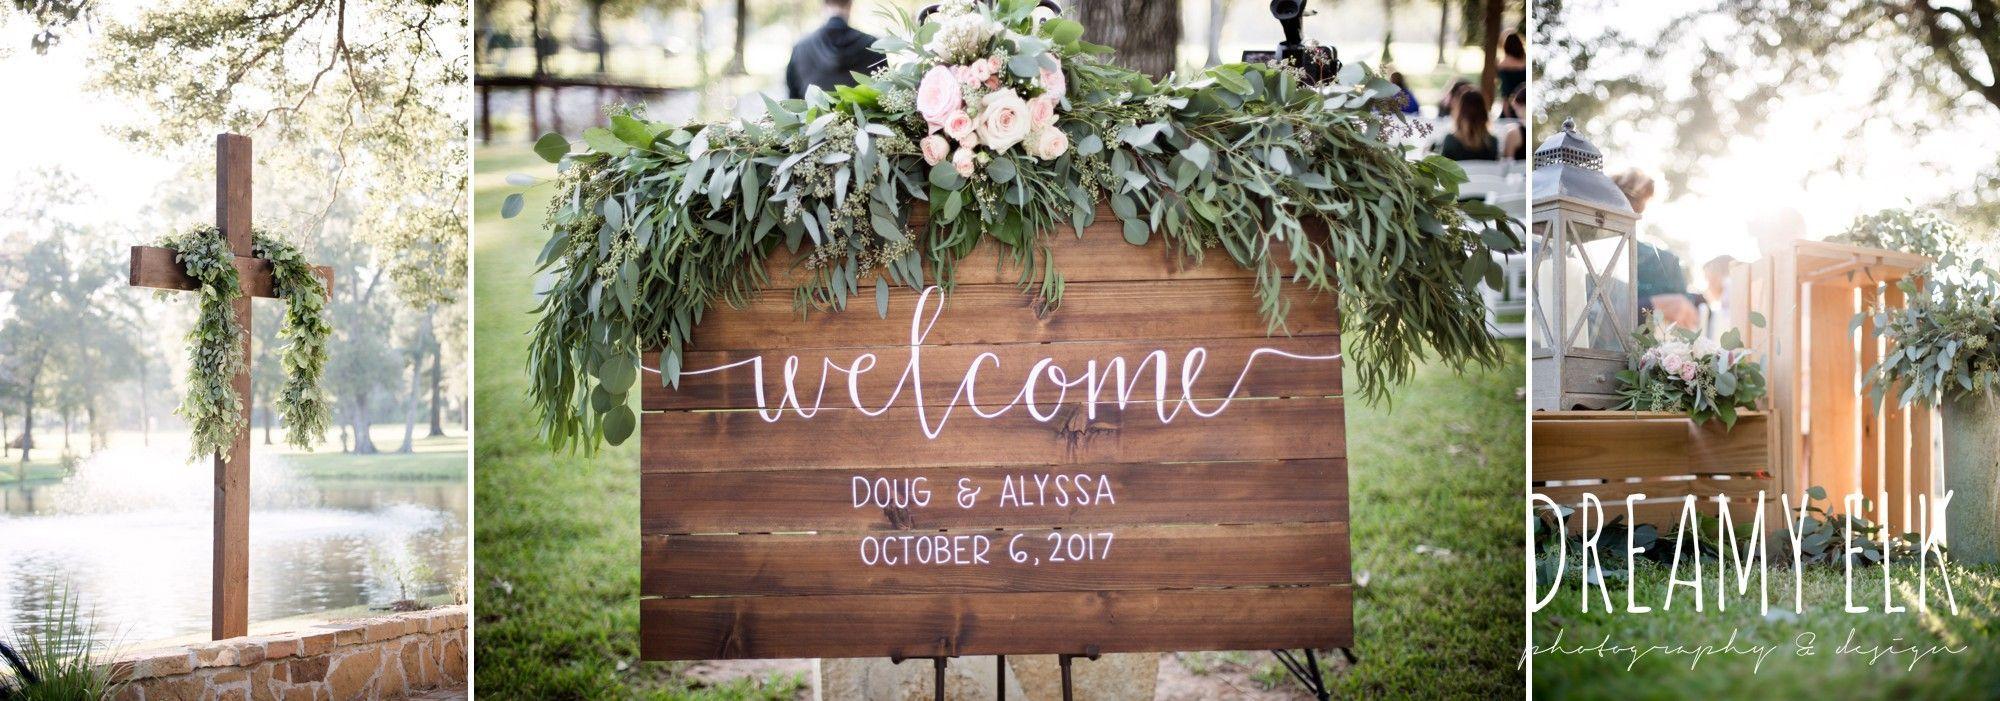 Wedding decor images  wedding decor wedding wooden signage outdoor fall october wedding